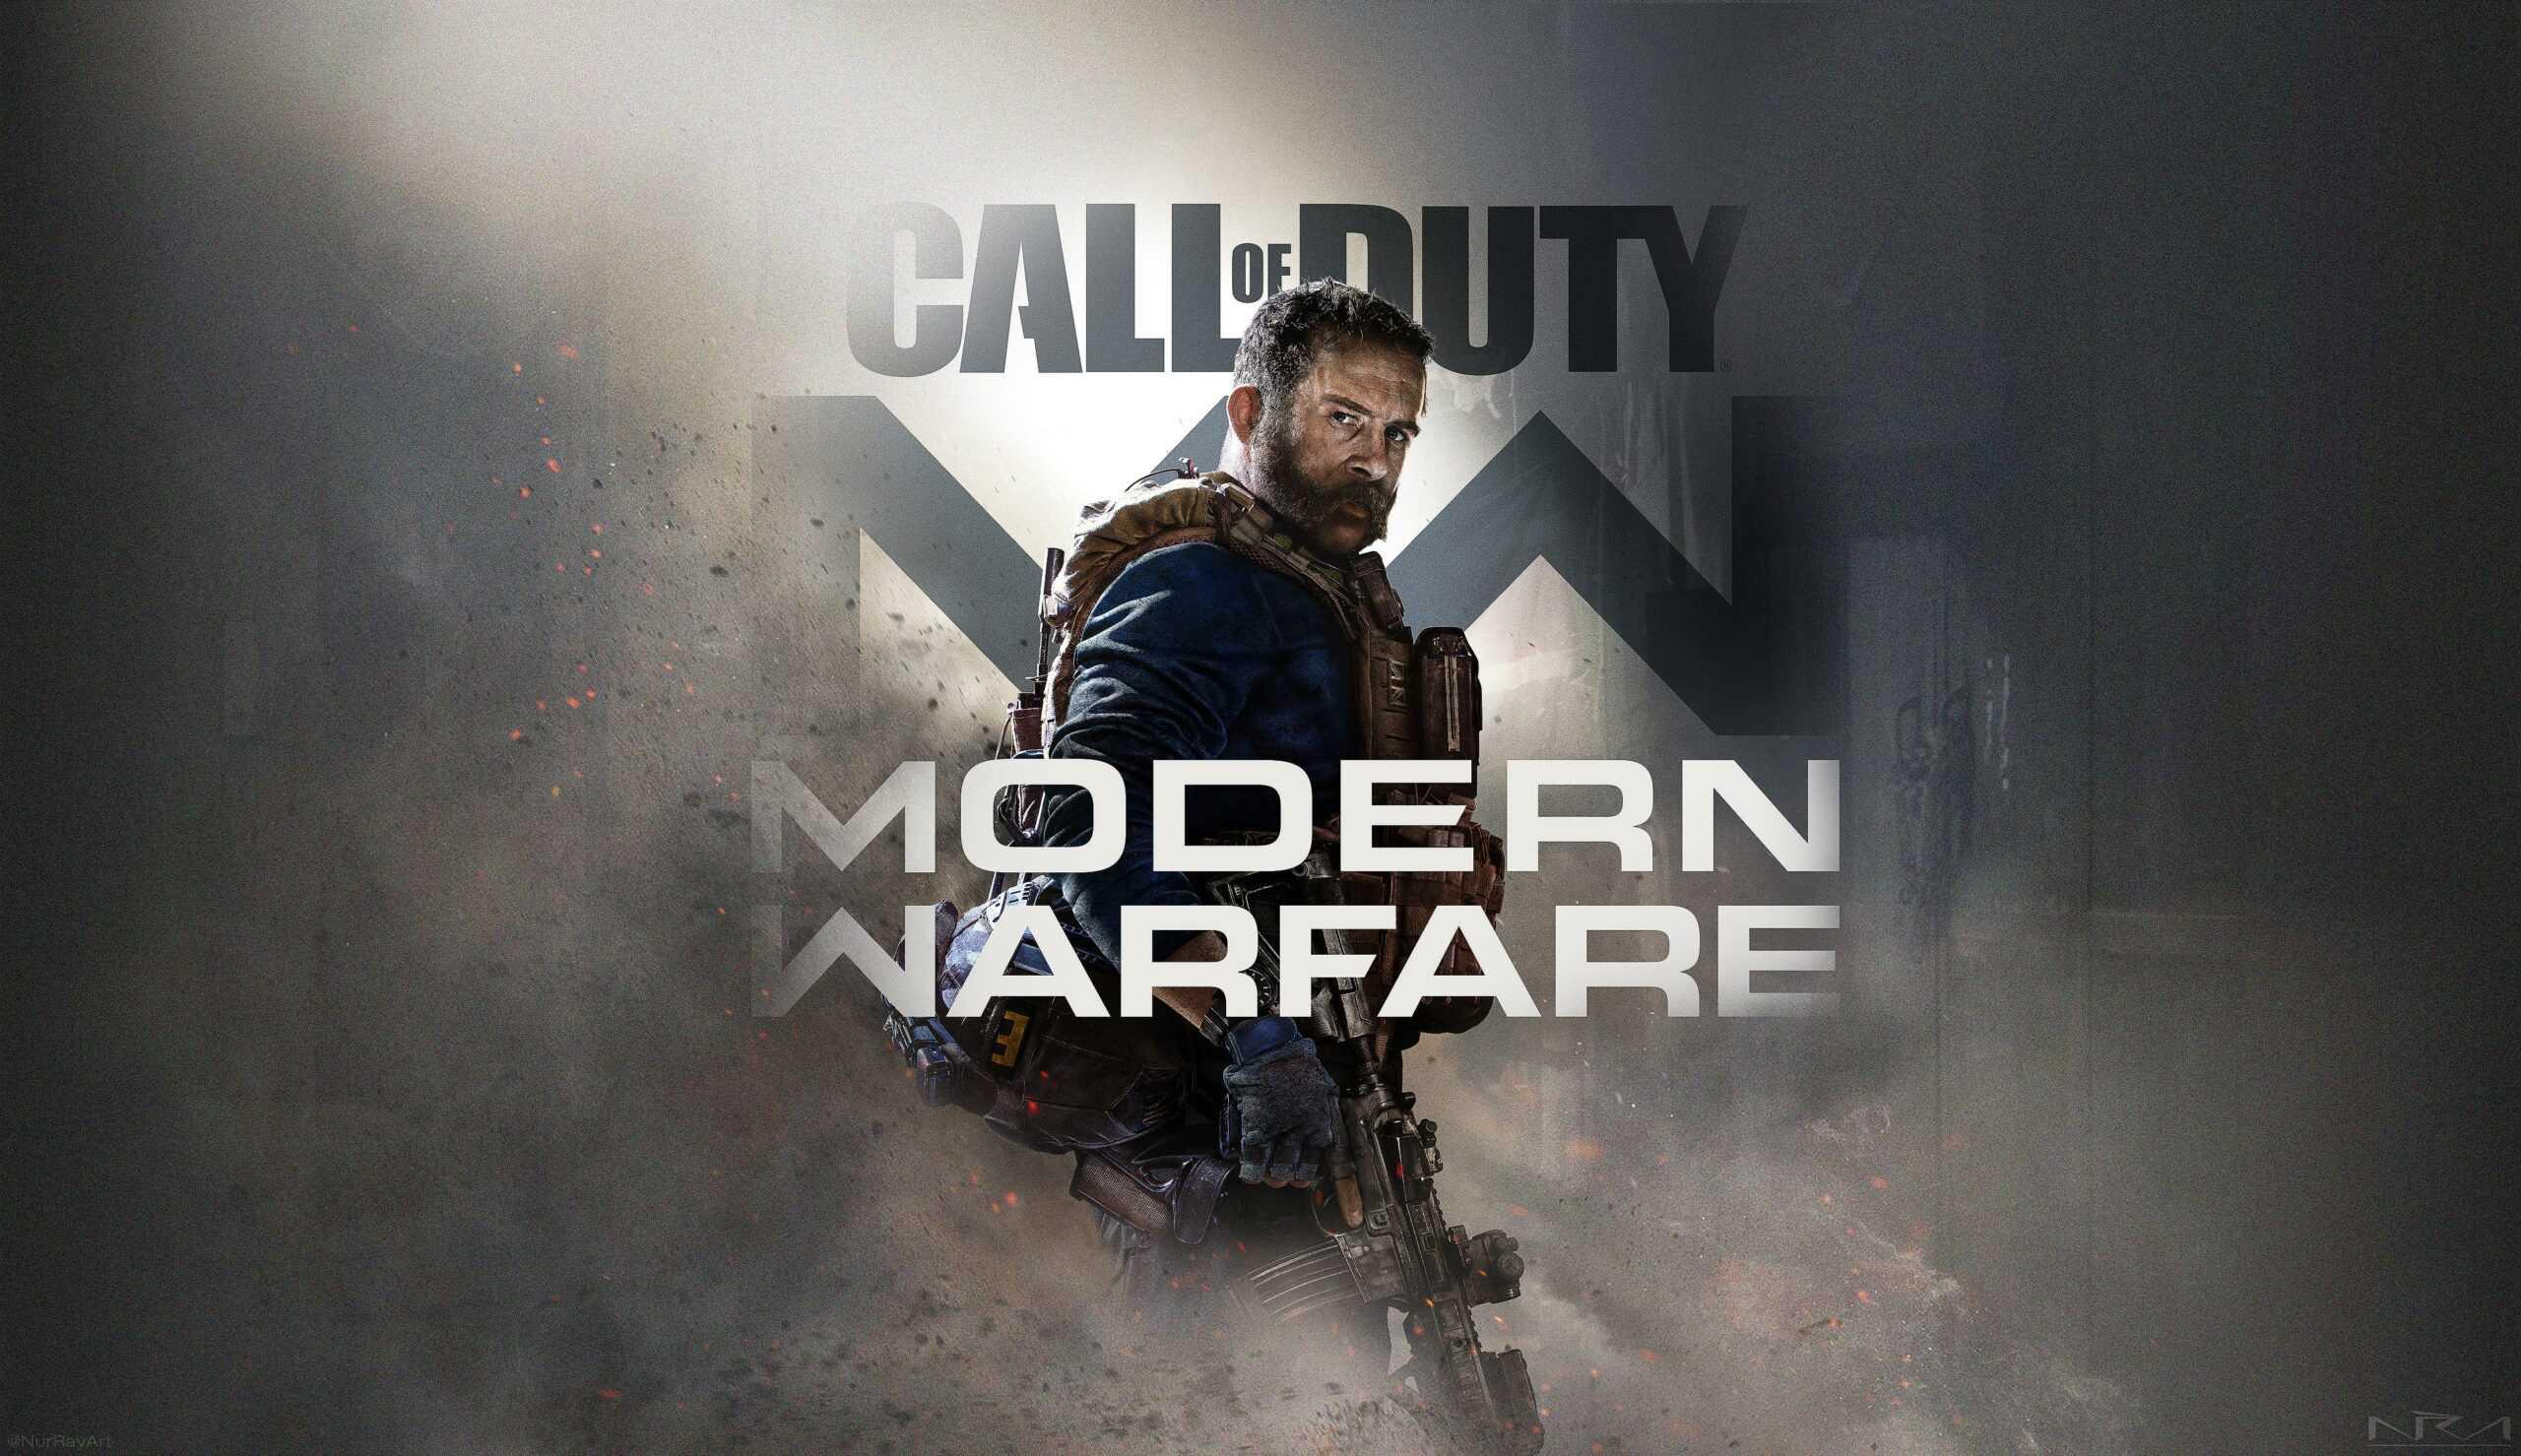 Best Call of Duty Games - Call of Duty Modern Warfare